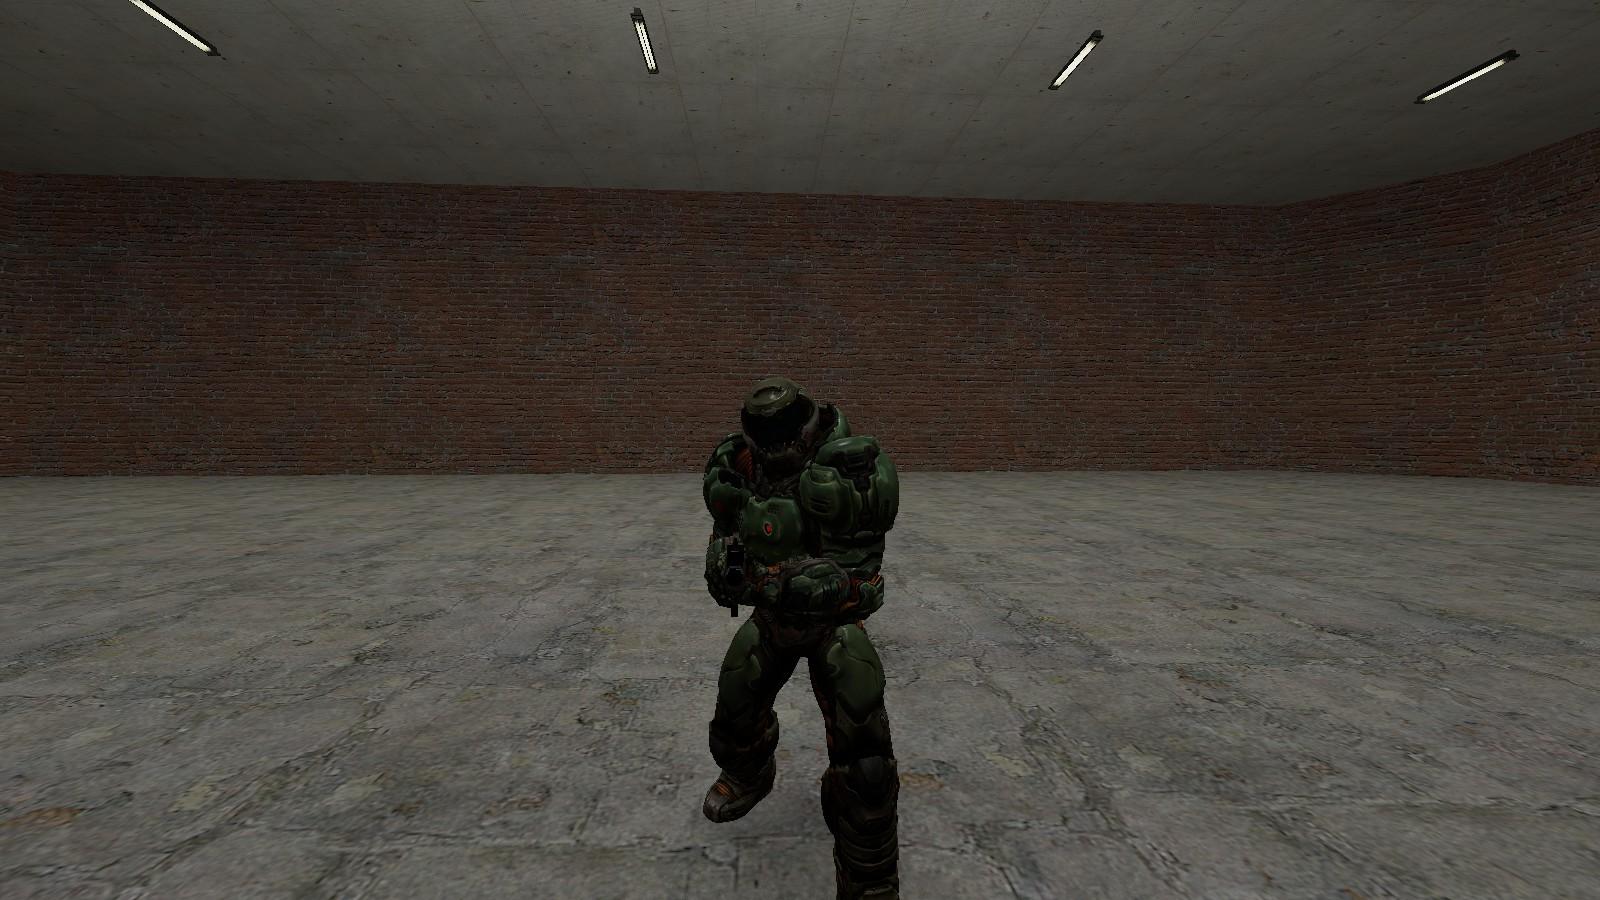 Doom guy (2016) player model | SGM Community (Serious GMod)